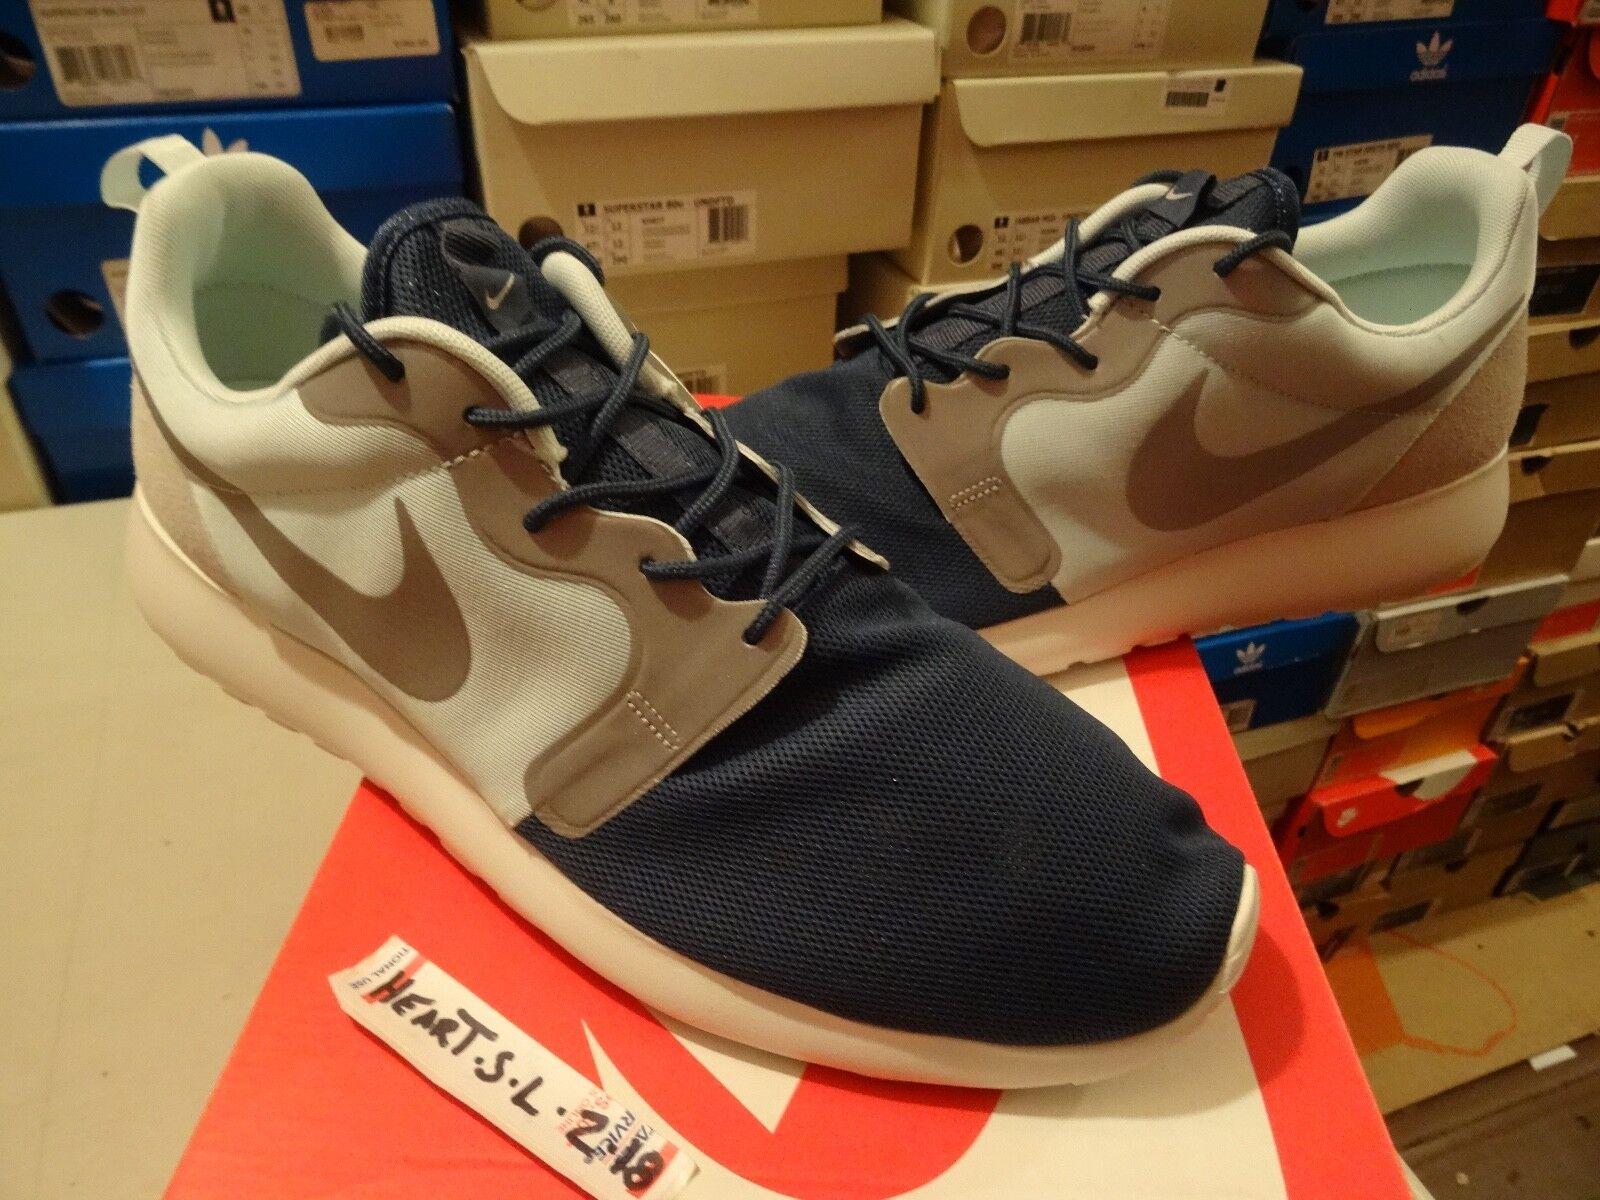 NEW Nike AIR MAX Roshe Hyperfuse QS Rosherun Navy bluee 1 Grey 616325-341 SZ 13